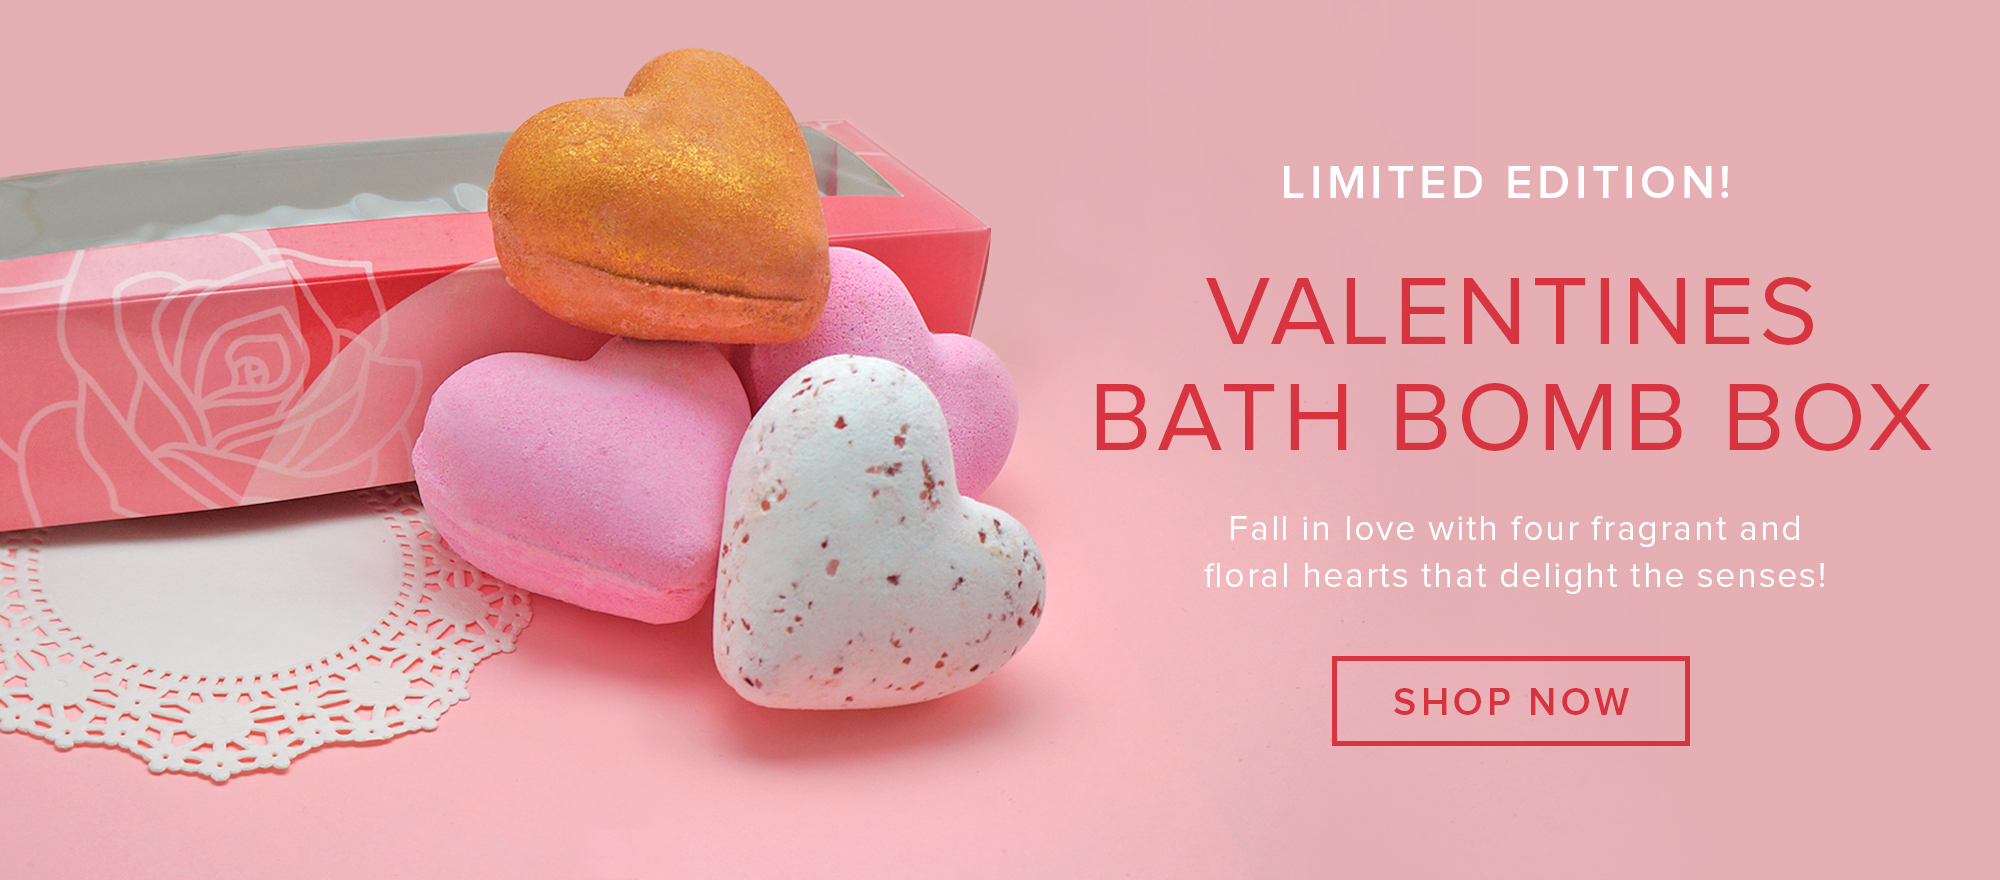 Valentines Bath Bomb Box